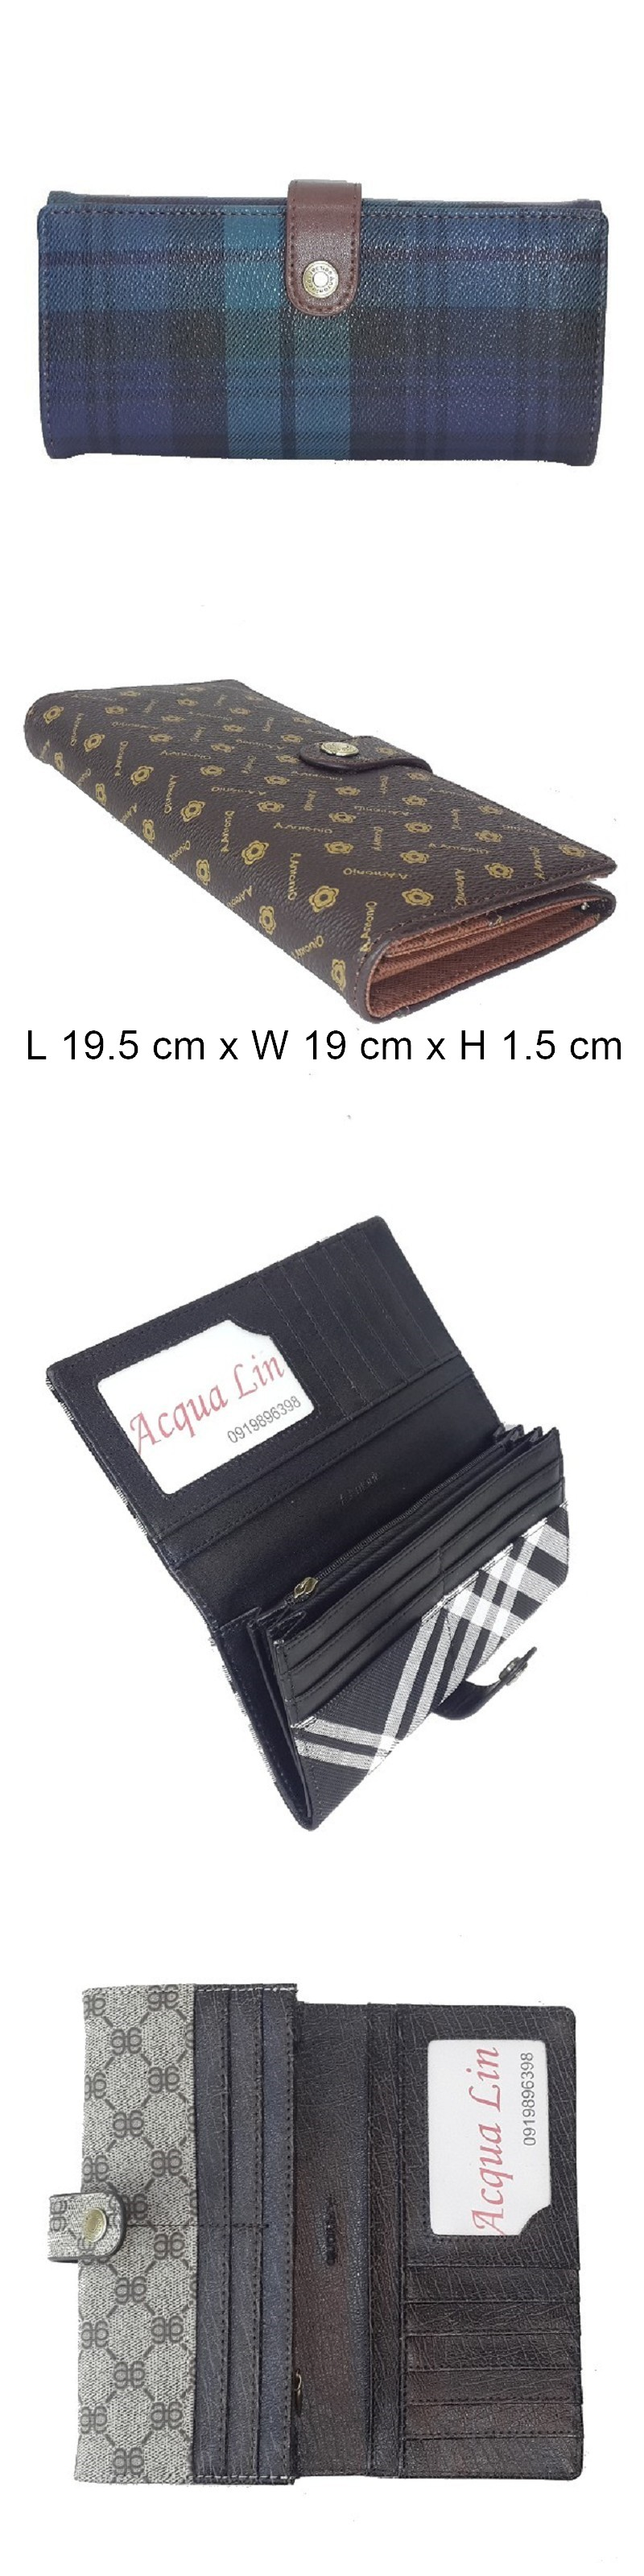 a.antonio  bi-fold wallet 080set1